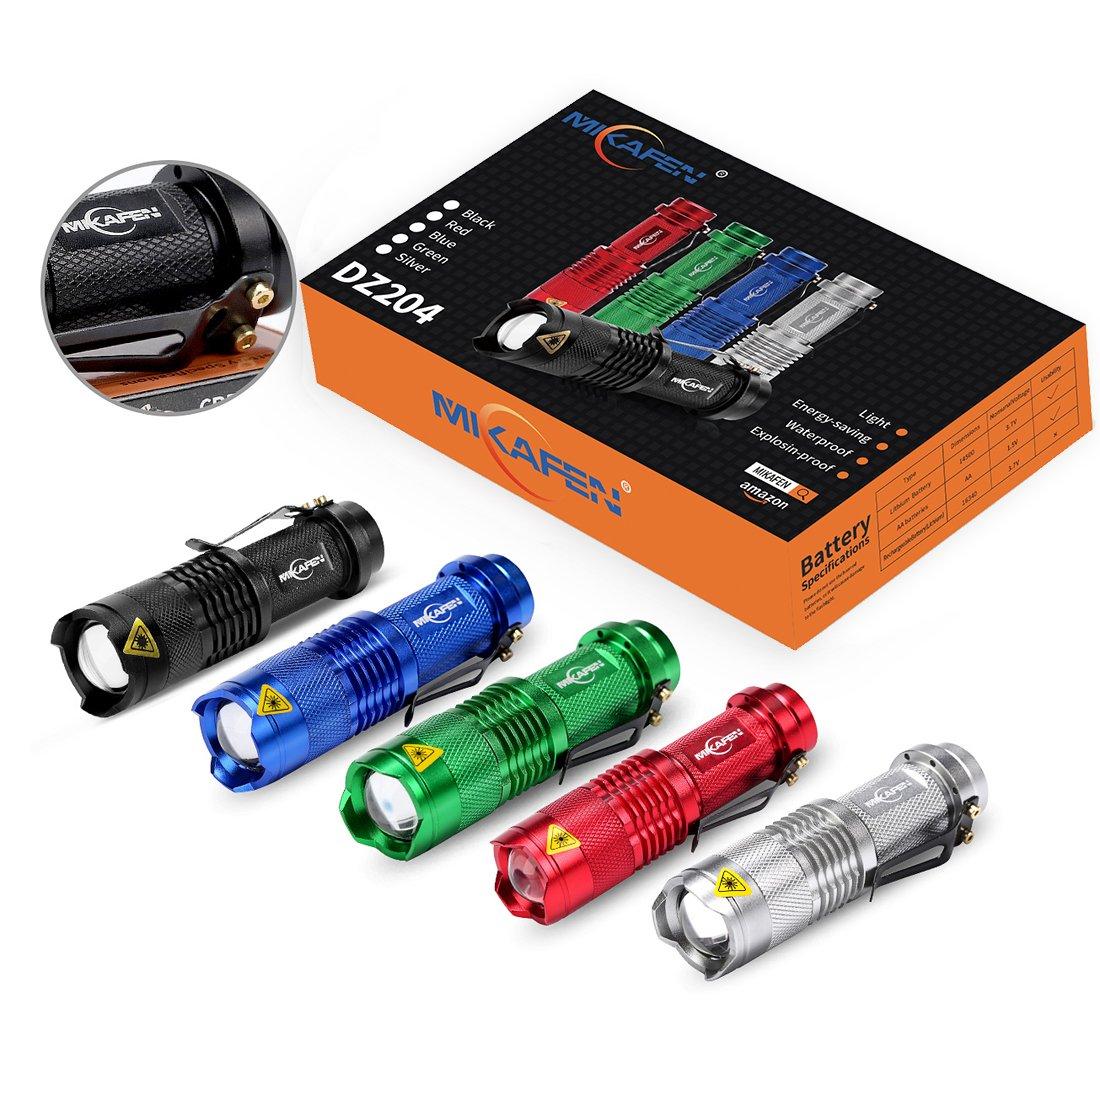 5 St/ück Mini Cree Q5 Led Taschenlampe Torch 300 Lumen 3 Modi Licht - Low-Light - Strobe einstellbarer Fokus zoombare Led